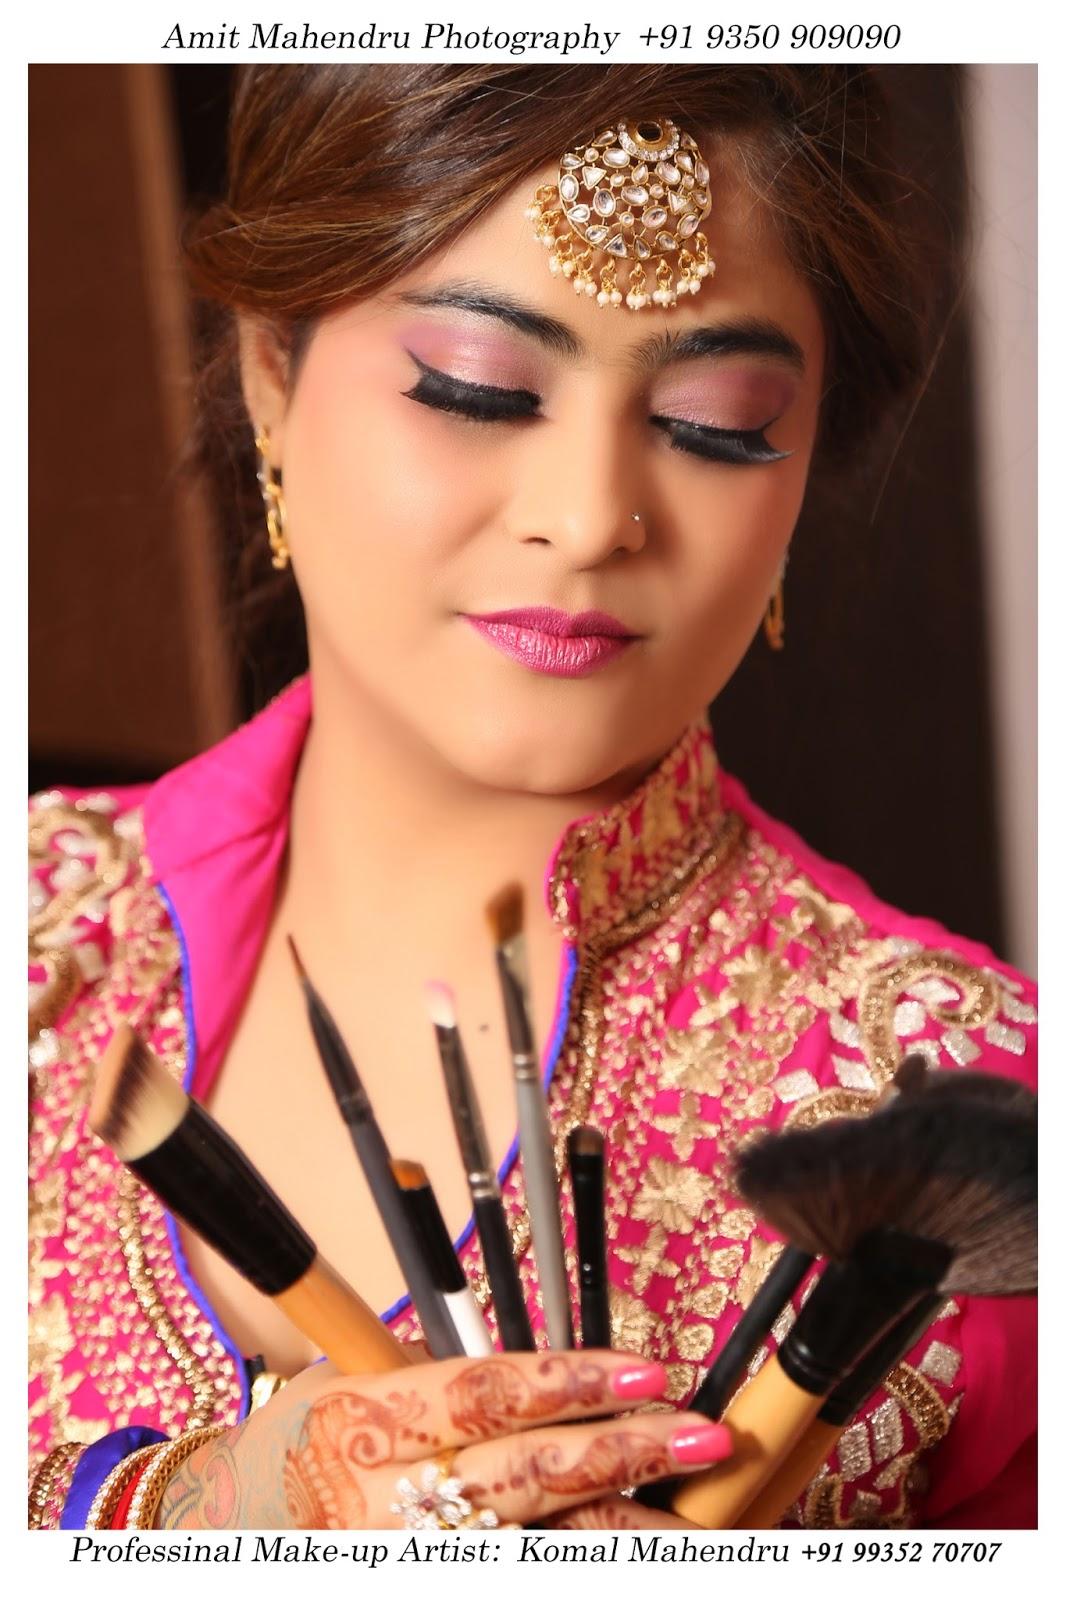 Komal mahendru s professional makeup lucknow india bridal makeup - Makeup Artist In Lucknow Https Www Facebook Com Komal Mahendru